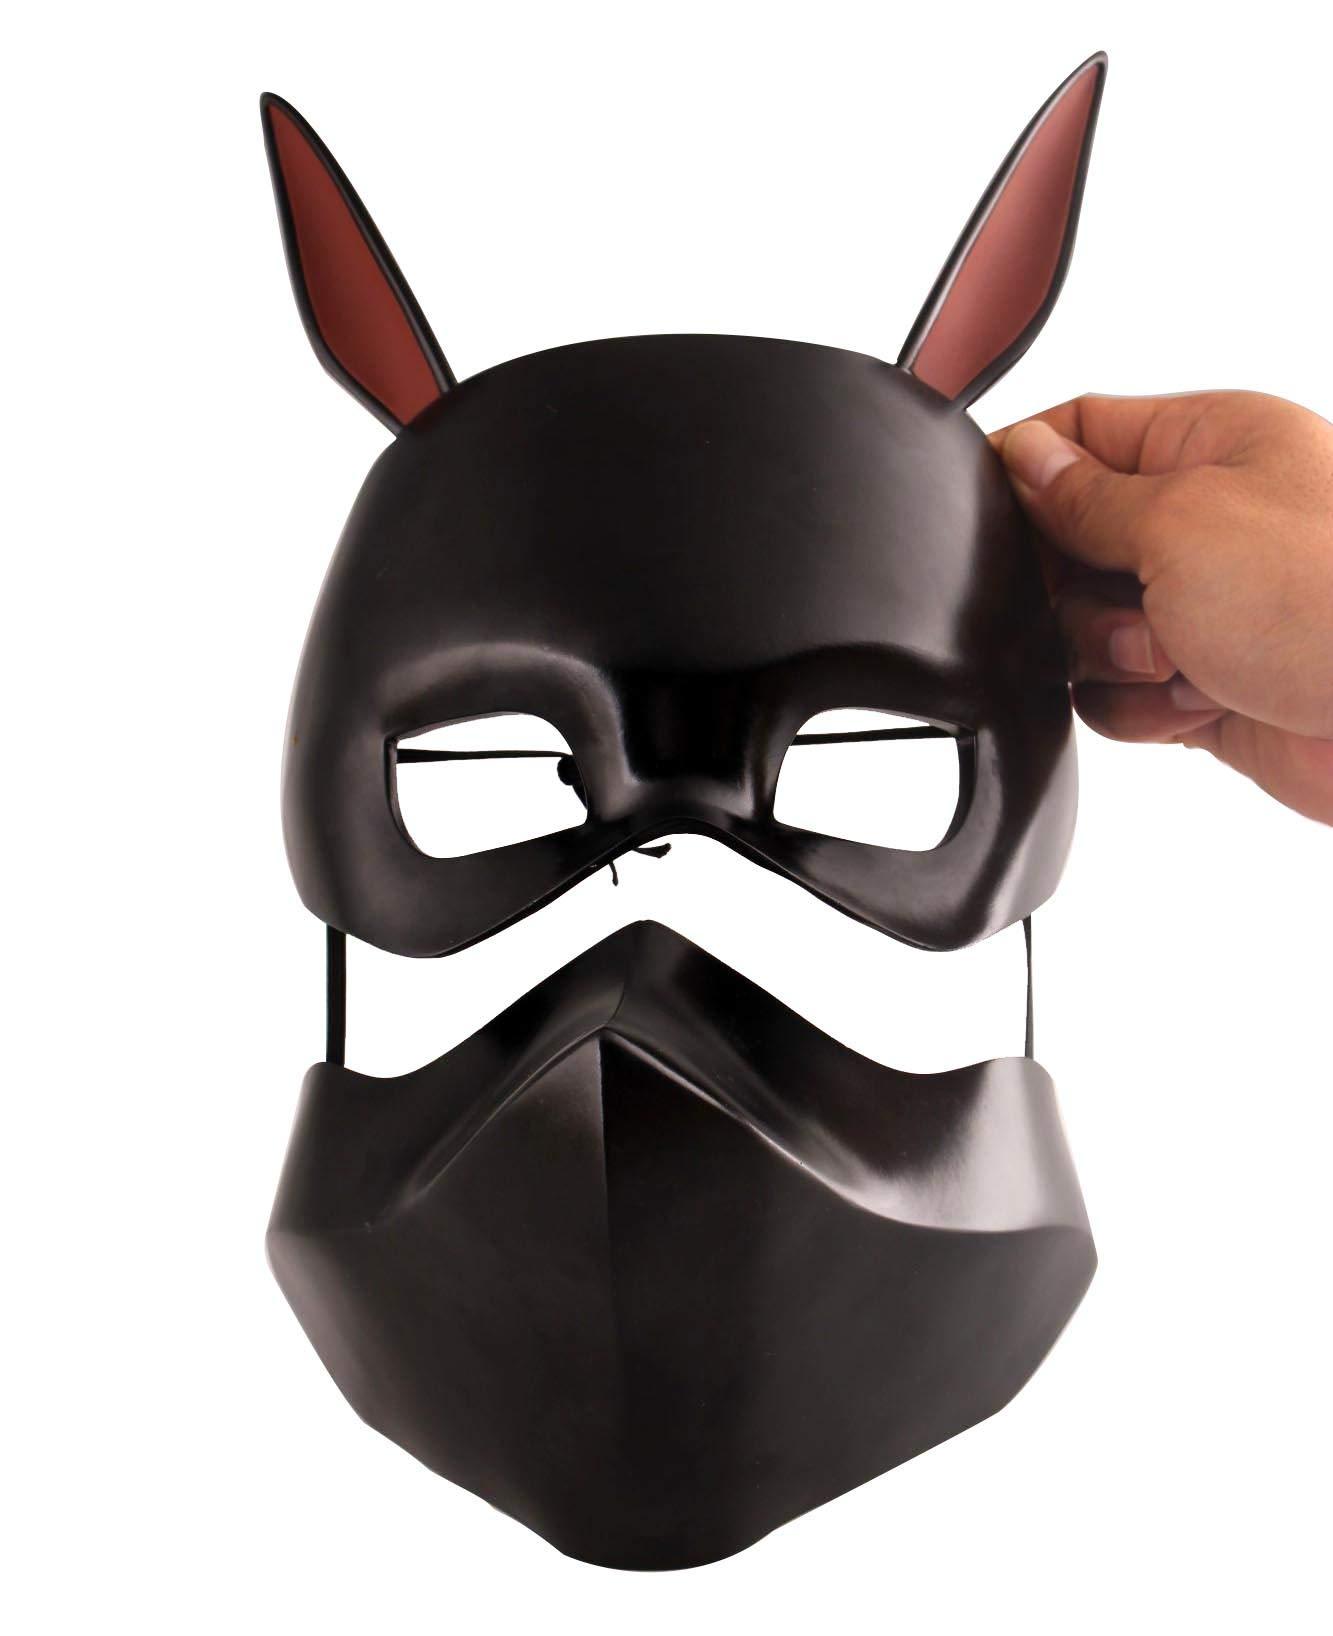 Gmasking Tokyo Ghoul Kirishima Ayato Black Cosplay Mask 1:1 Replica Props